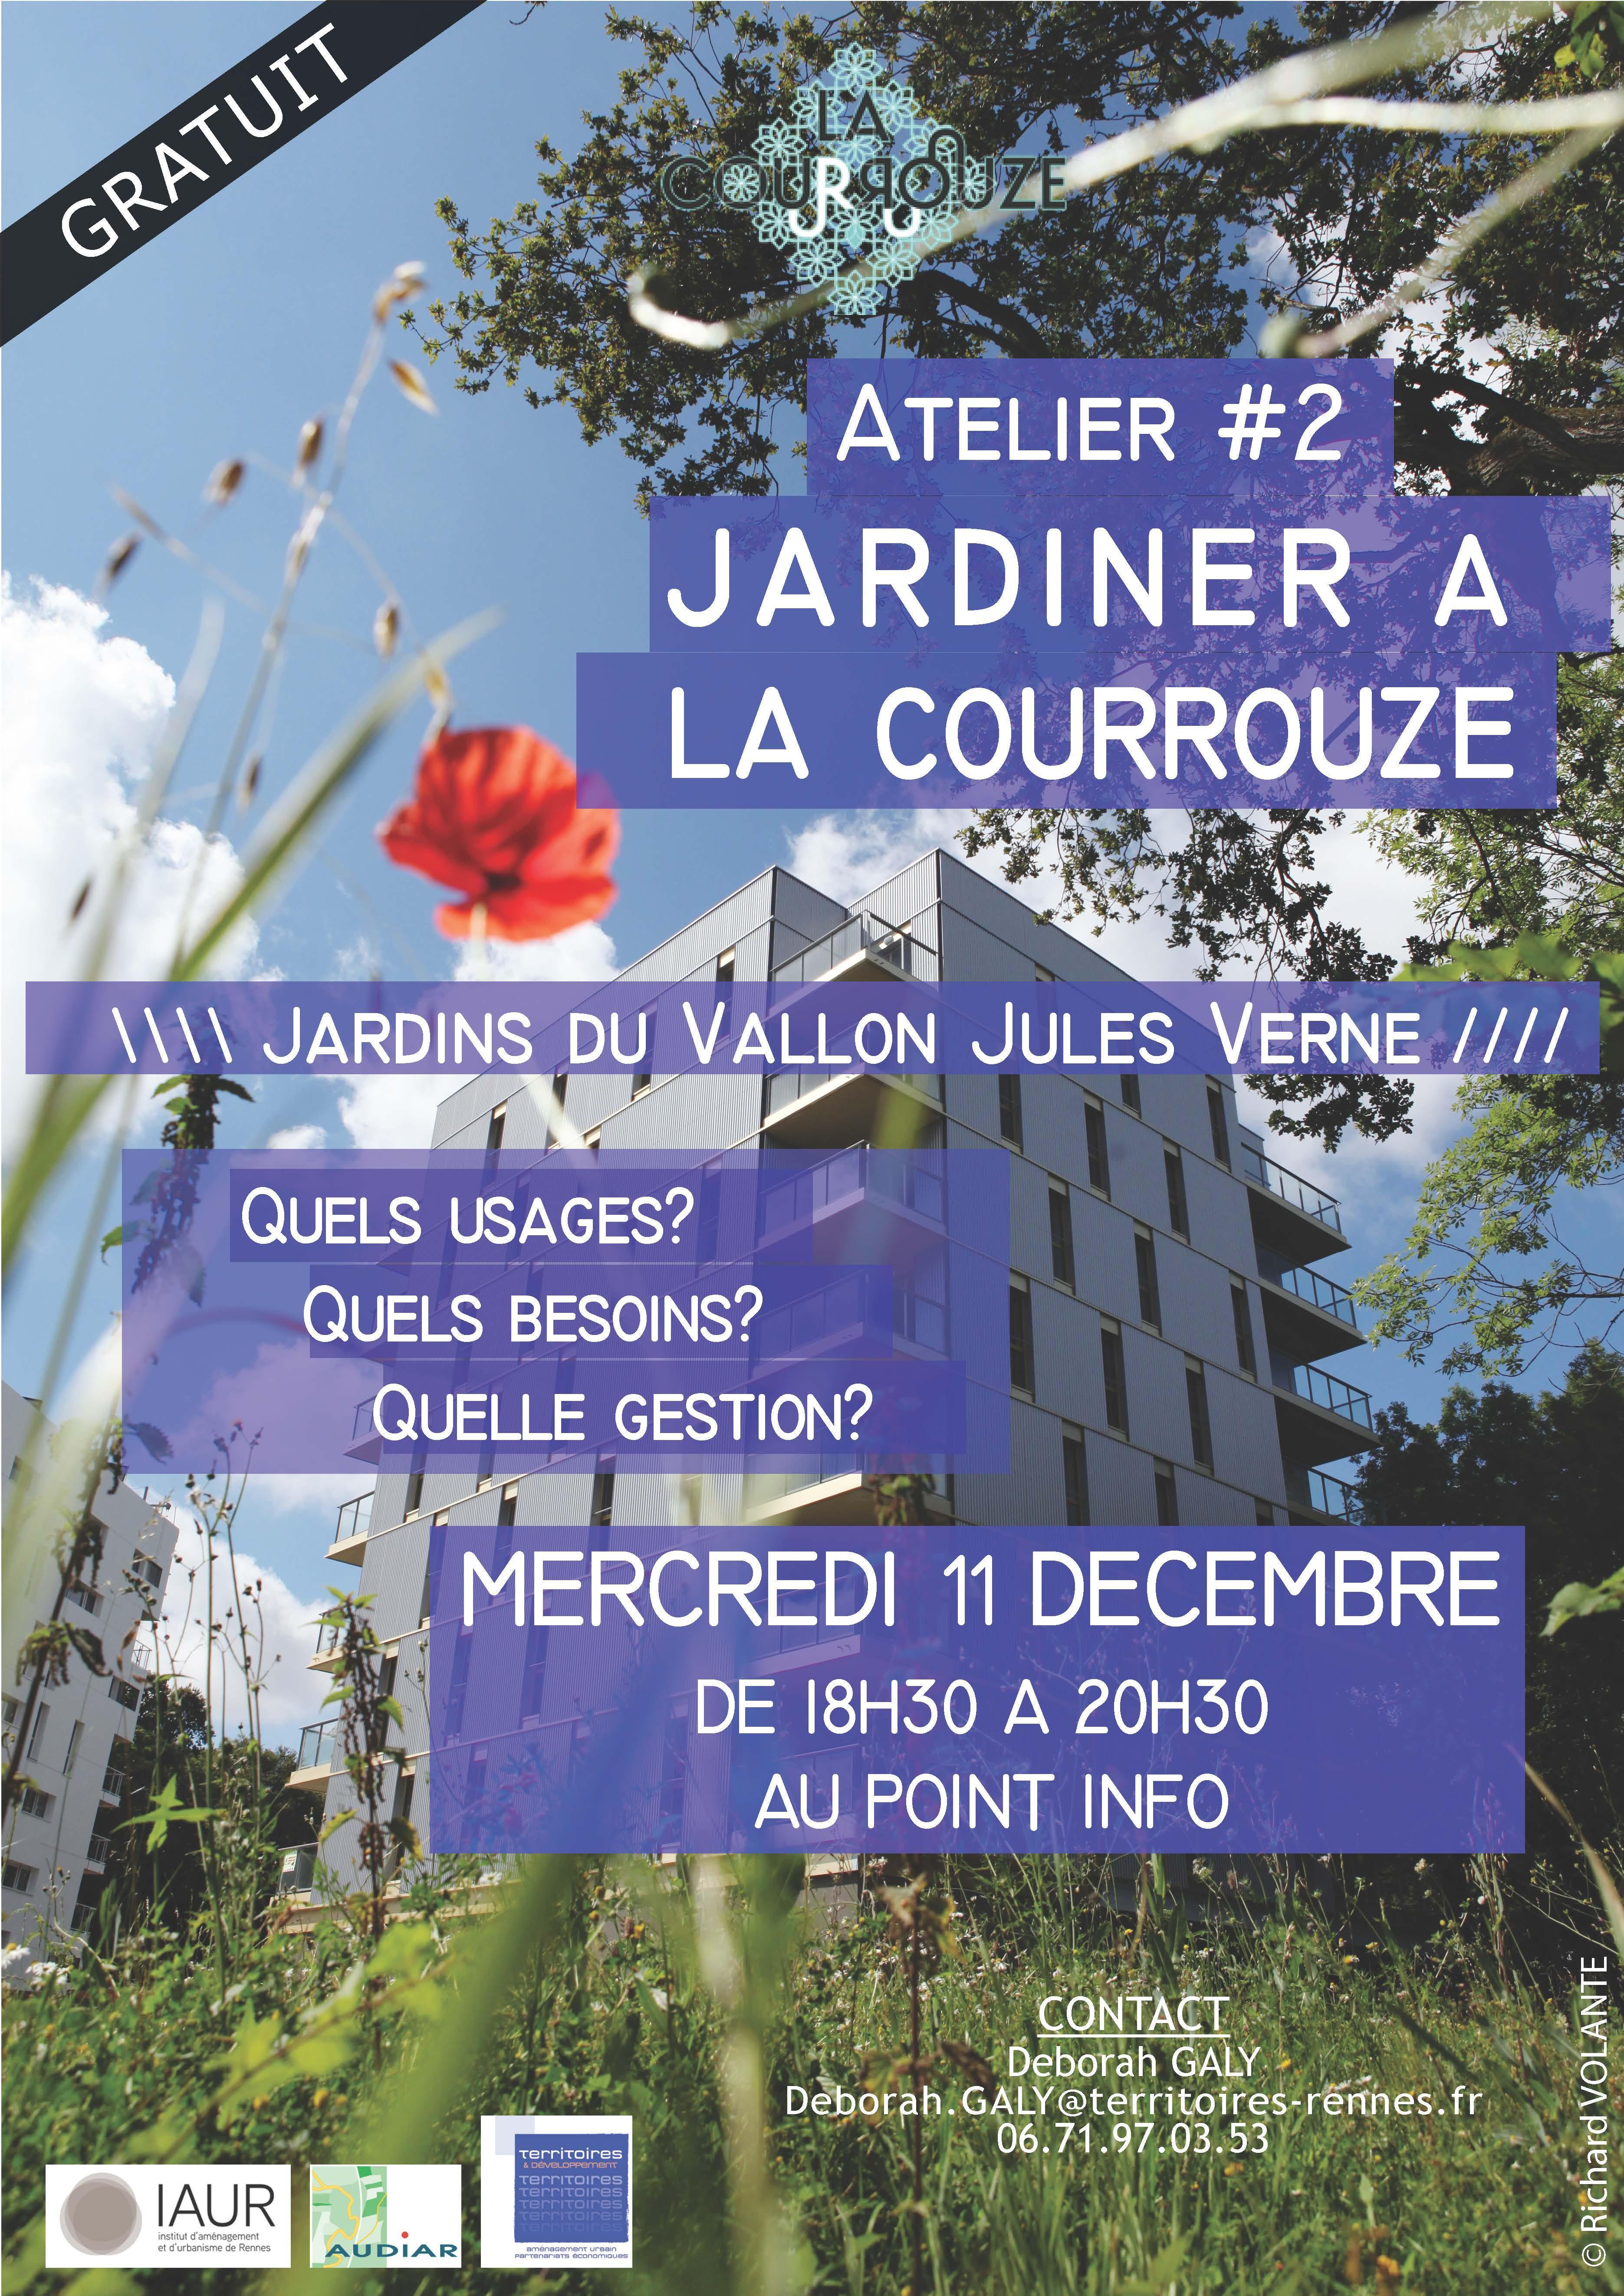 flyer_Atelier#2 Jardins